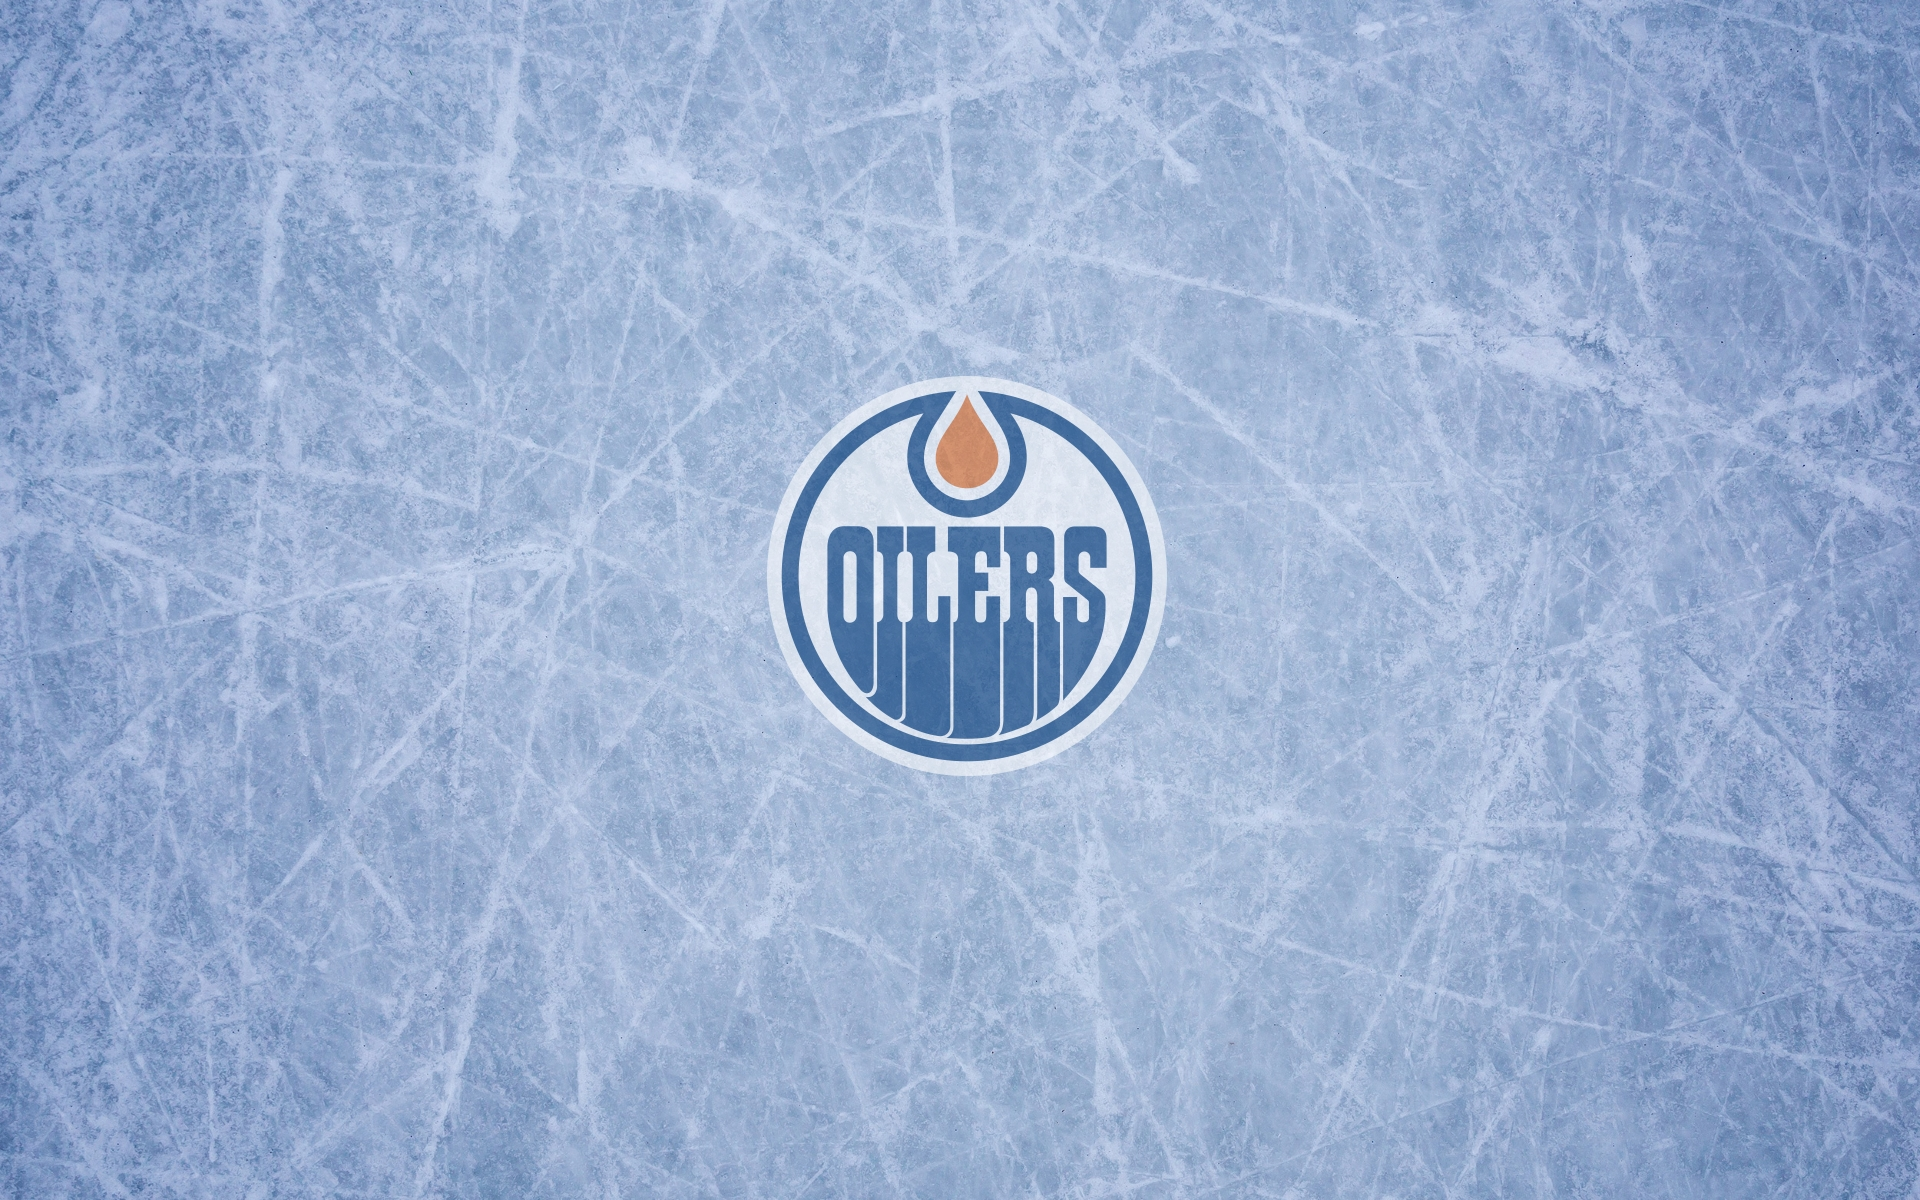 Good Wallpaper Logo Edmonton Oilers - Edmonton_Oilers_wallpaper_logo_1920x1200_16x10  Photograph_219419.jpg